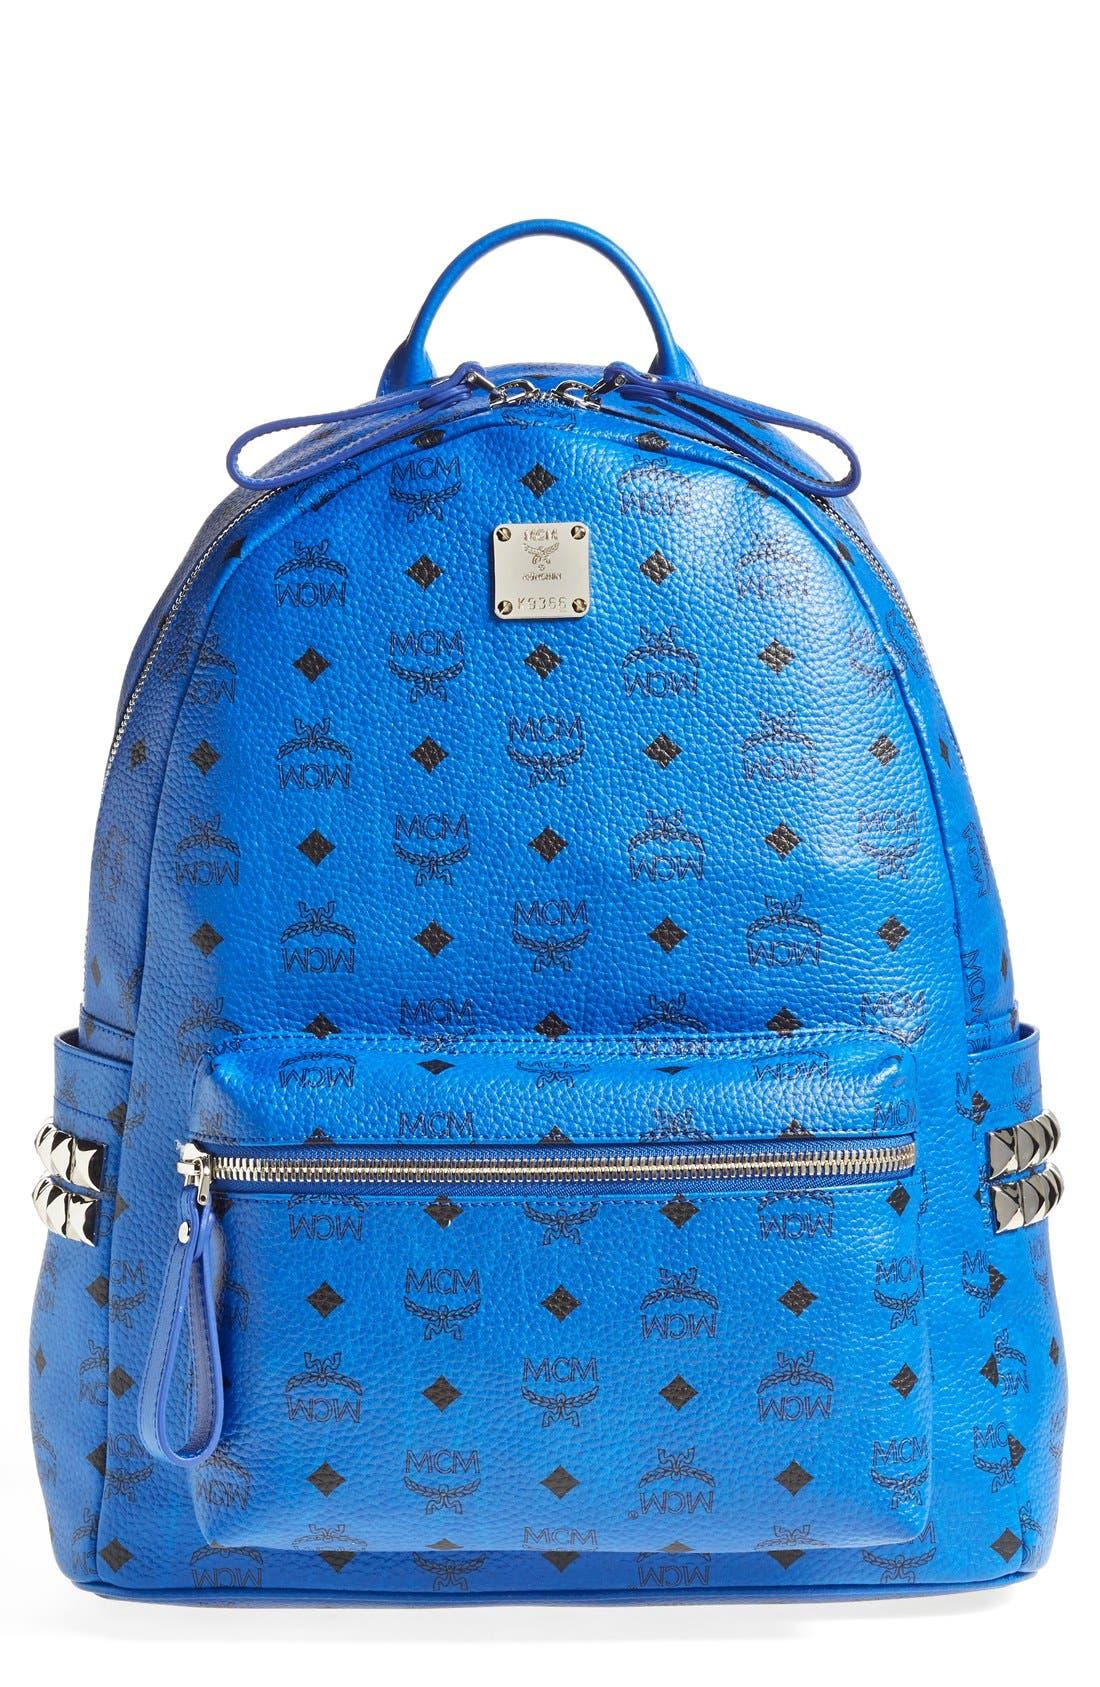 Main Image - MCM 'Medium Visetos' Coated Canvas Backpack